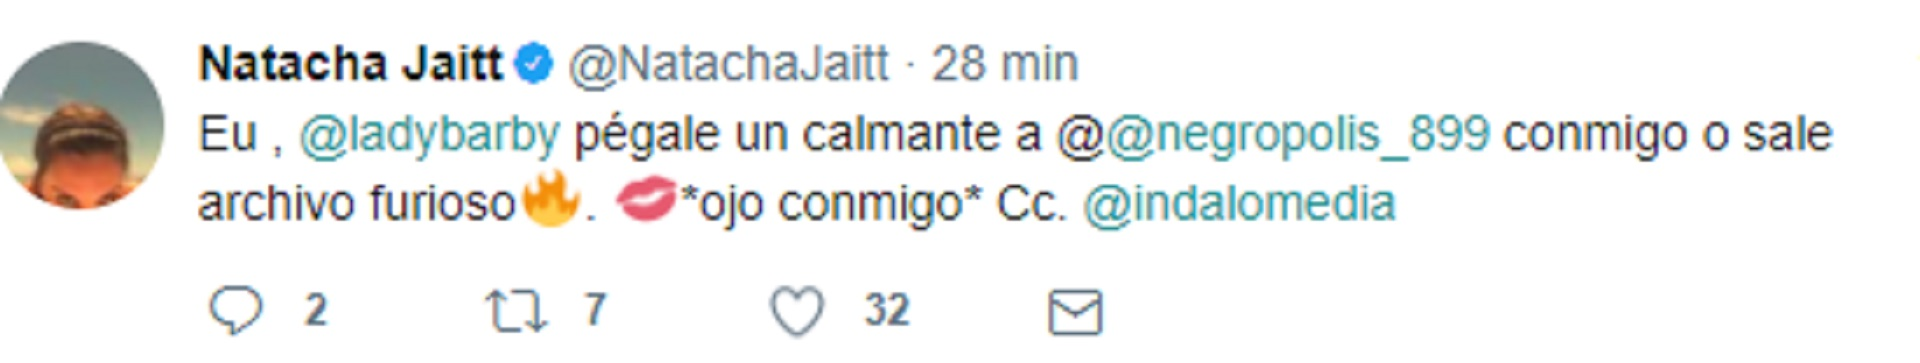 La furia de Natacha Jaitt vs La Negra Vernaci en Twitter